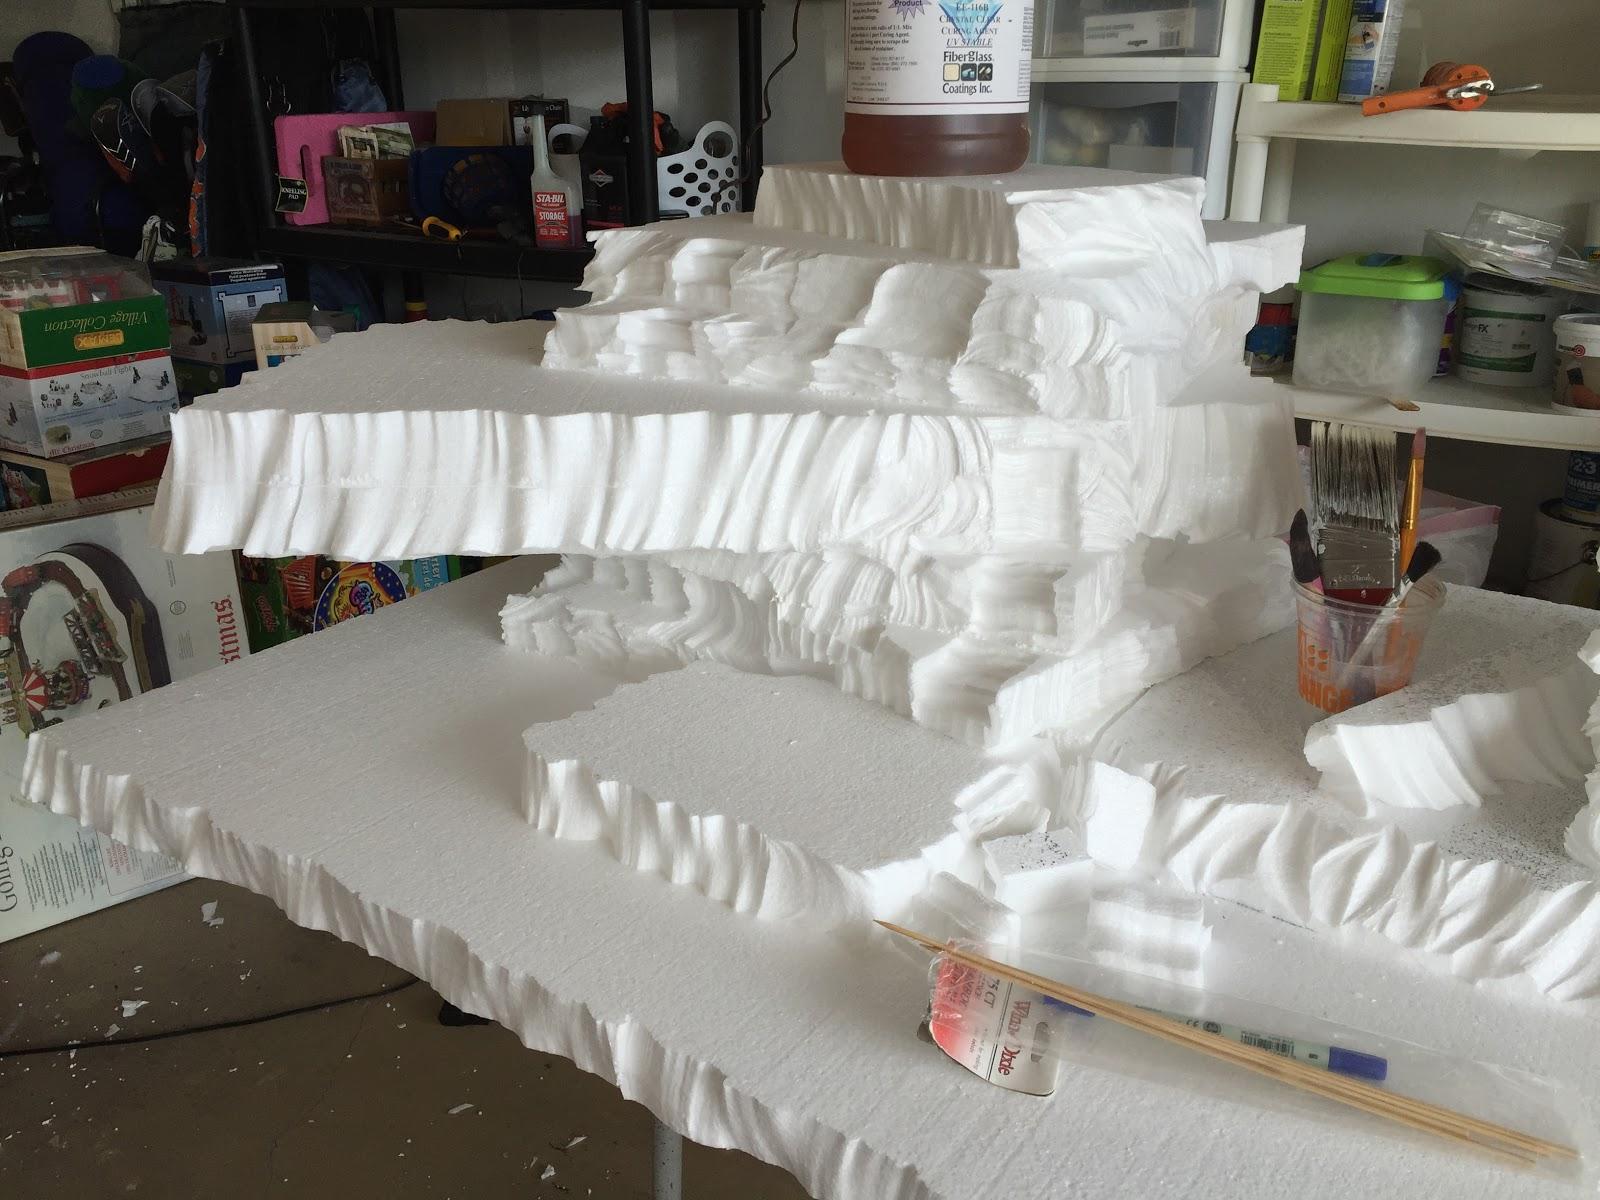 Copeland christmas blog: making a mini christmas village using styrofoam